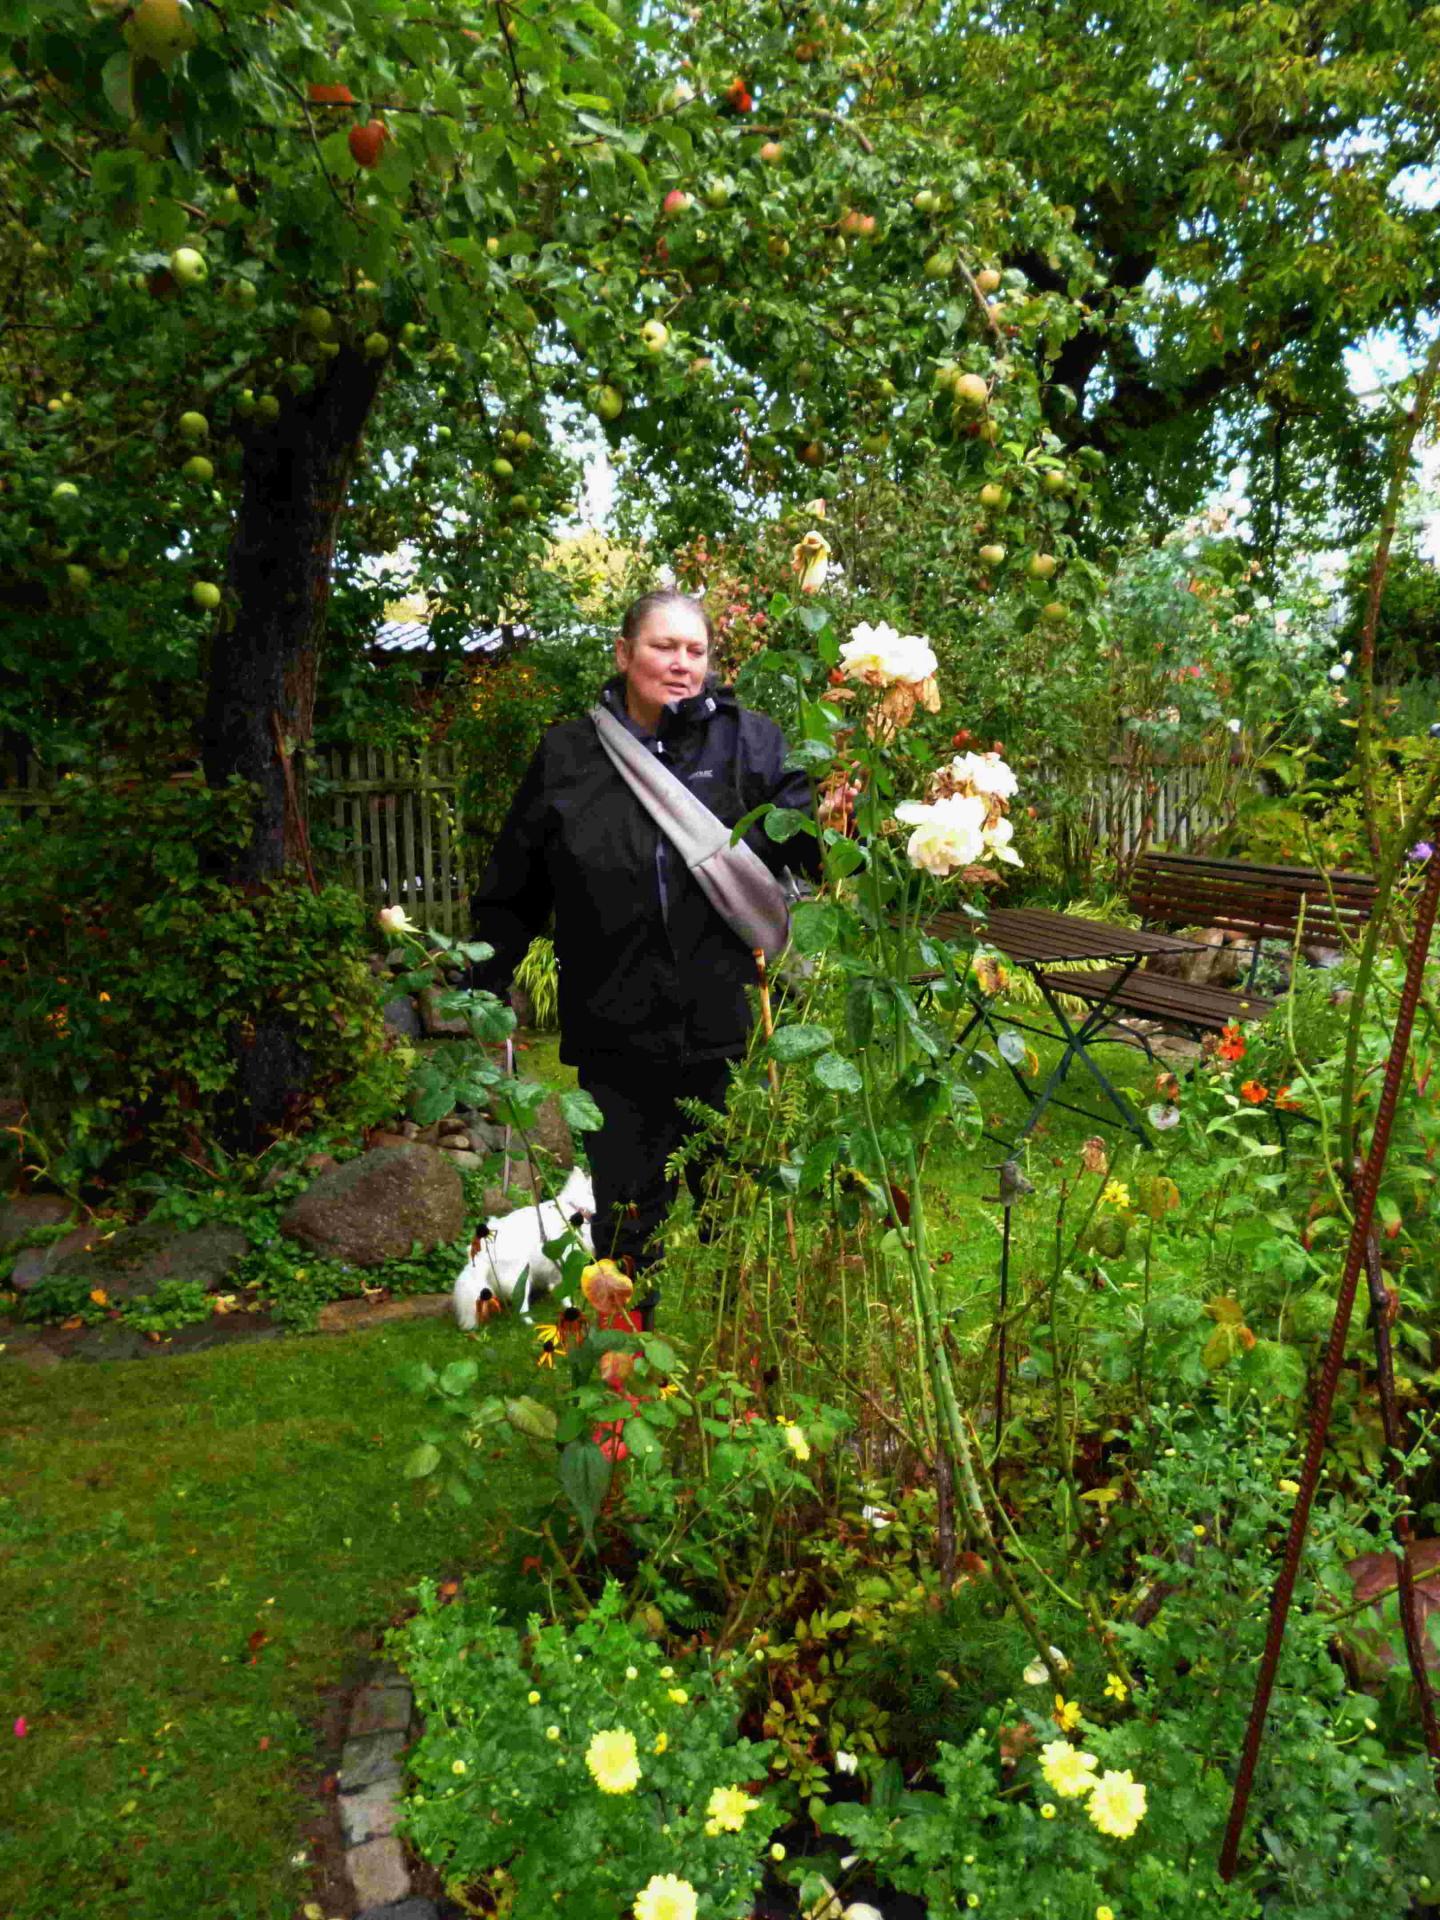 Offene Gartenpfporte 26-09-2020 Bild 09